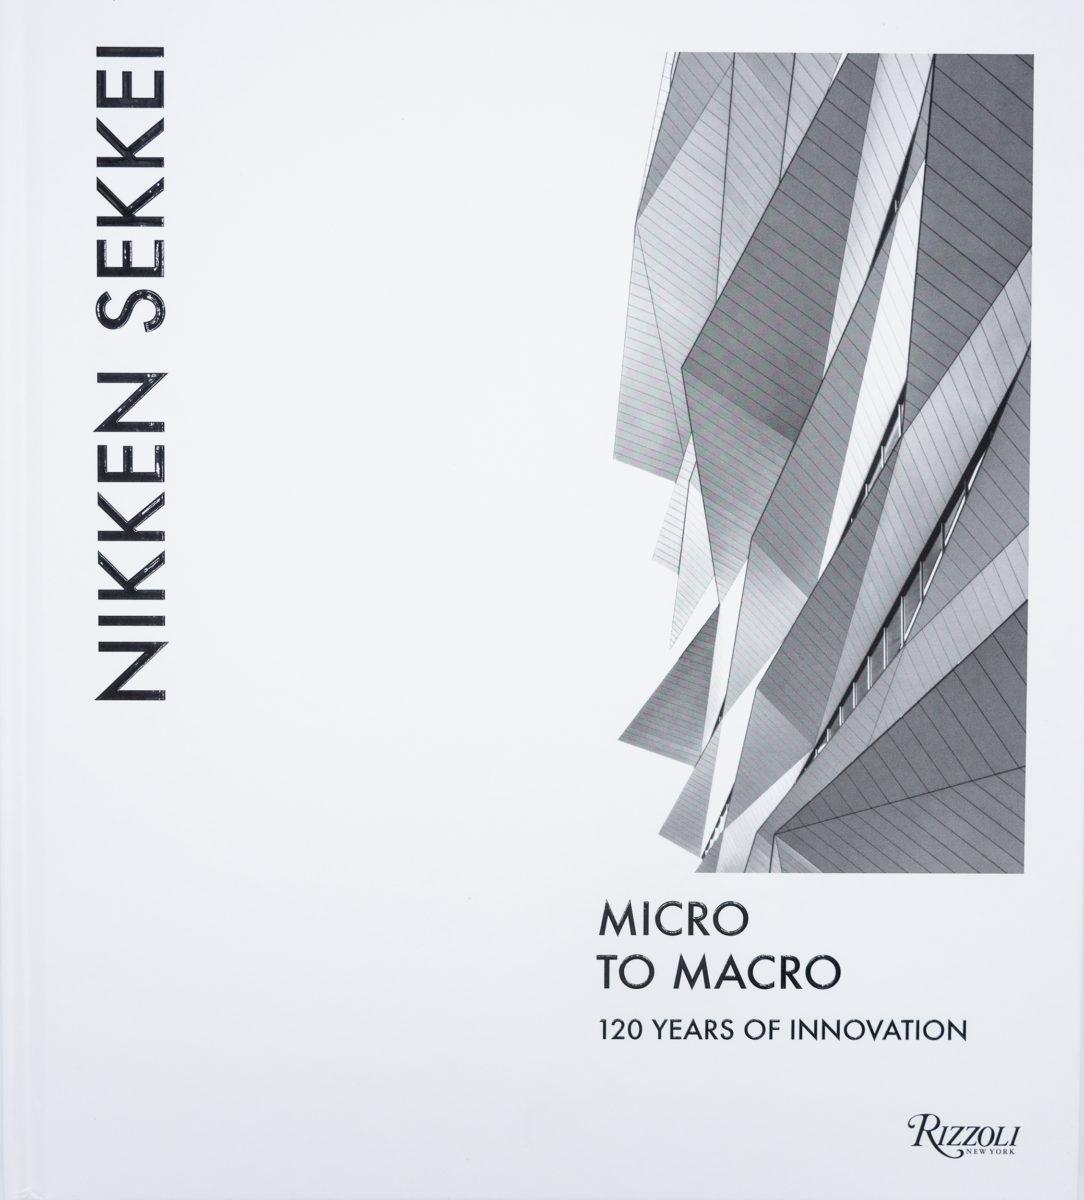 Nikken Sekkei , Micro to Macro, 120 years of innovation